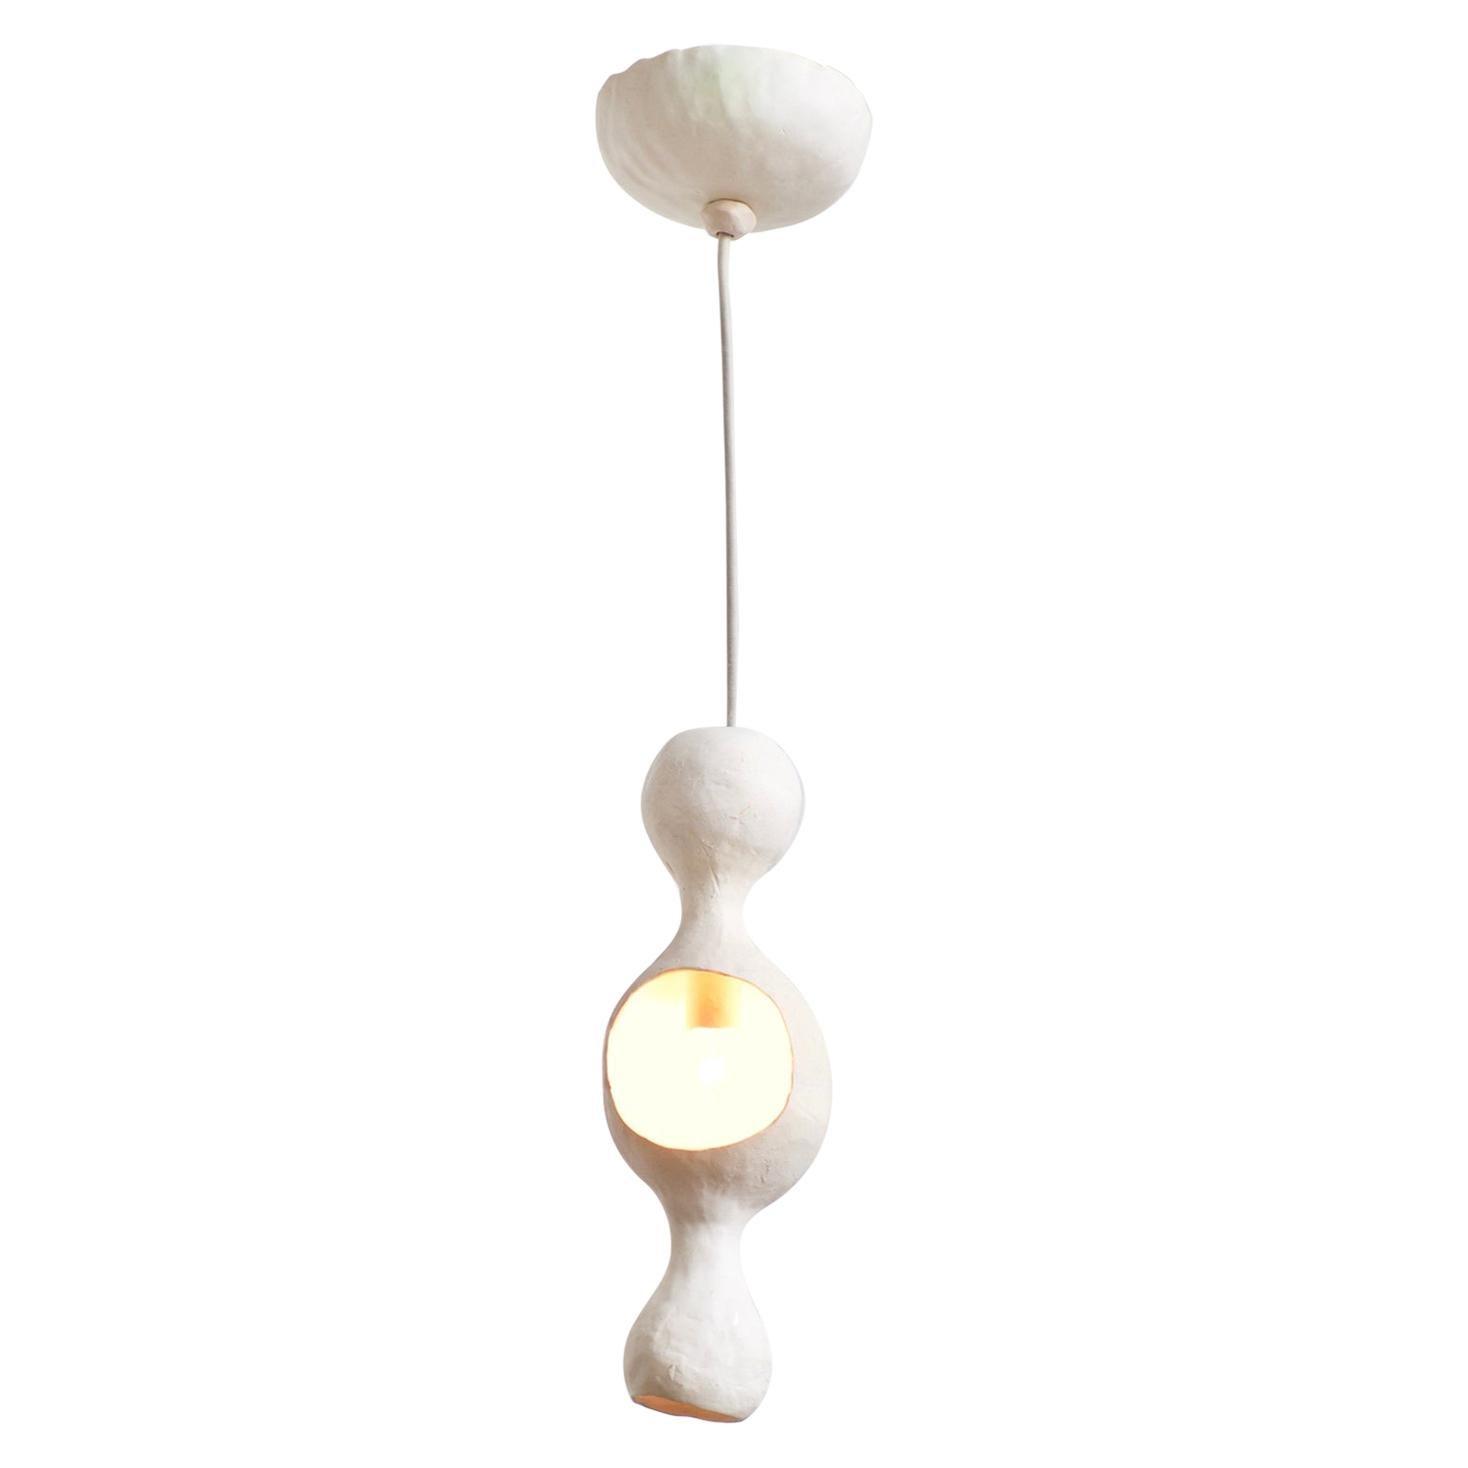 Contemporary Sculptural Hand-built Single-Shell Matte White Ceramic Pendant Lamp